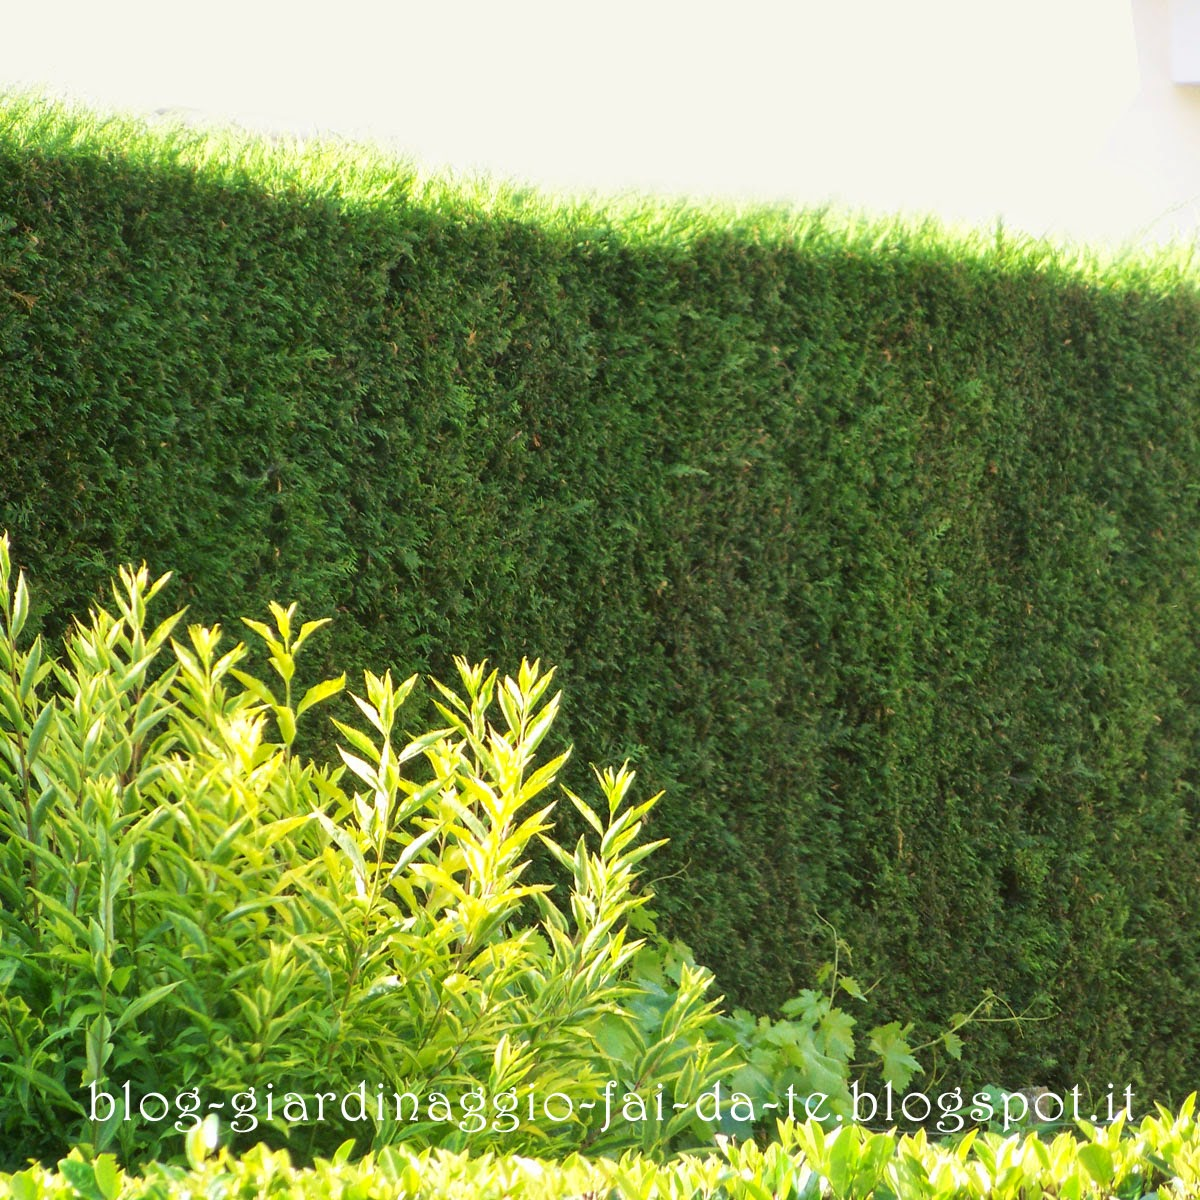 1200 x 1200 jpeg 365kB, Verdeblog Giardinaggio Fai Da Te # 2016 Car ...